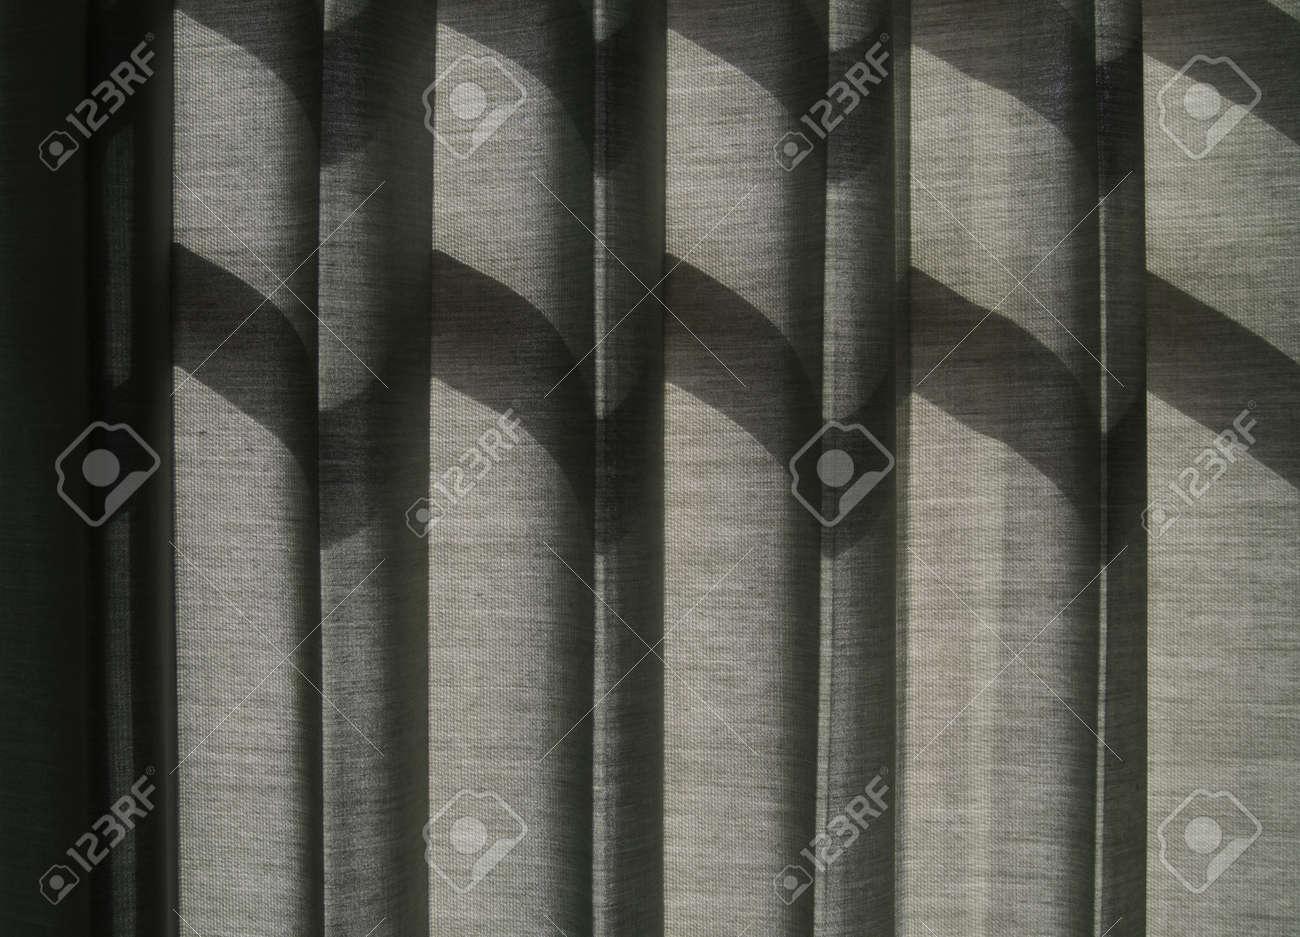 Shade on Grey Curtain, Sunlight Through a Window Stock Photo - 14414340